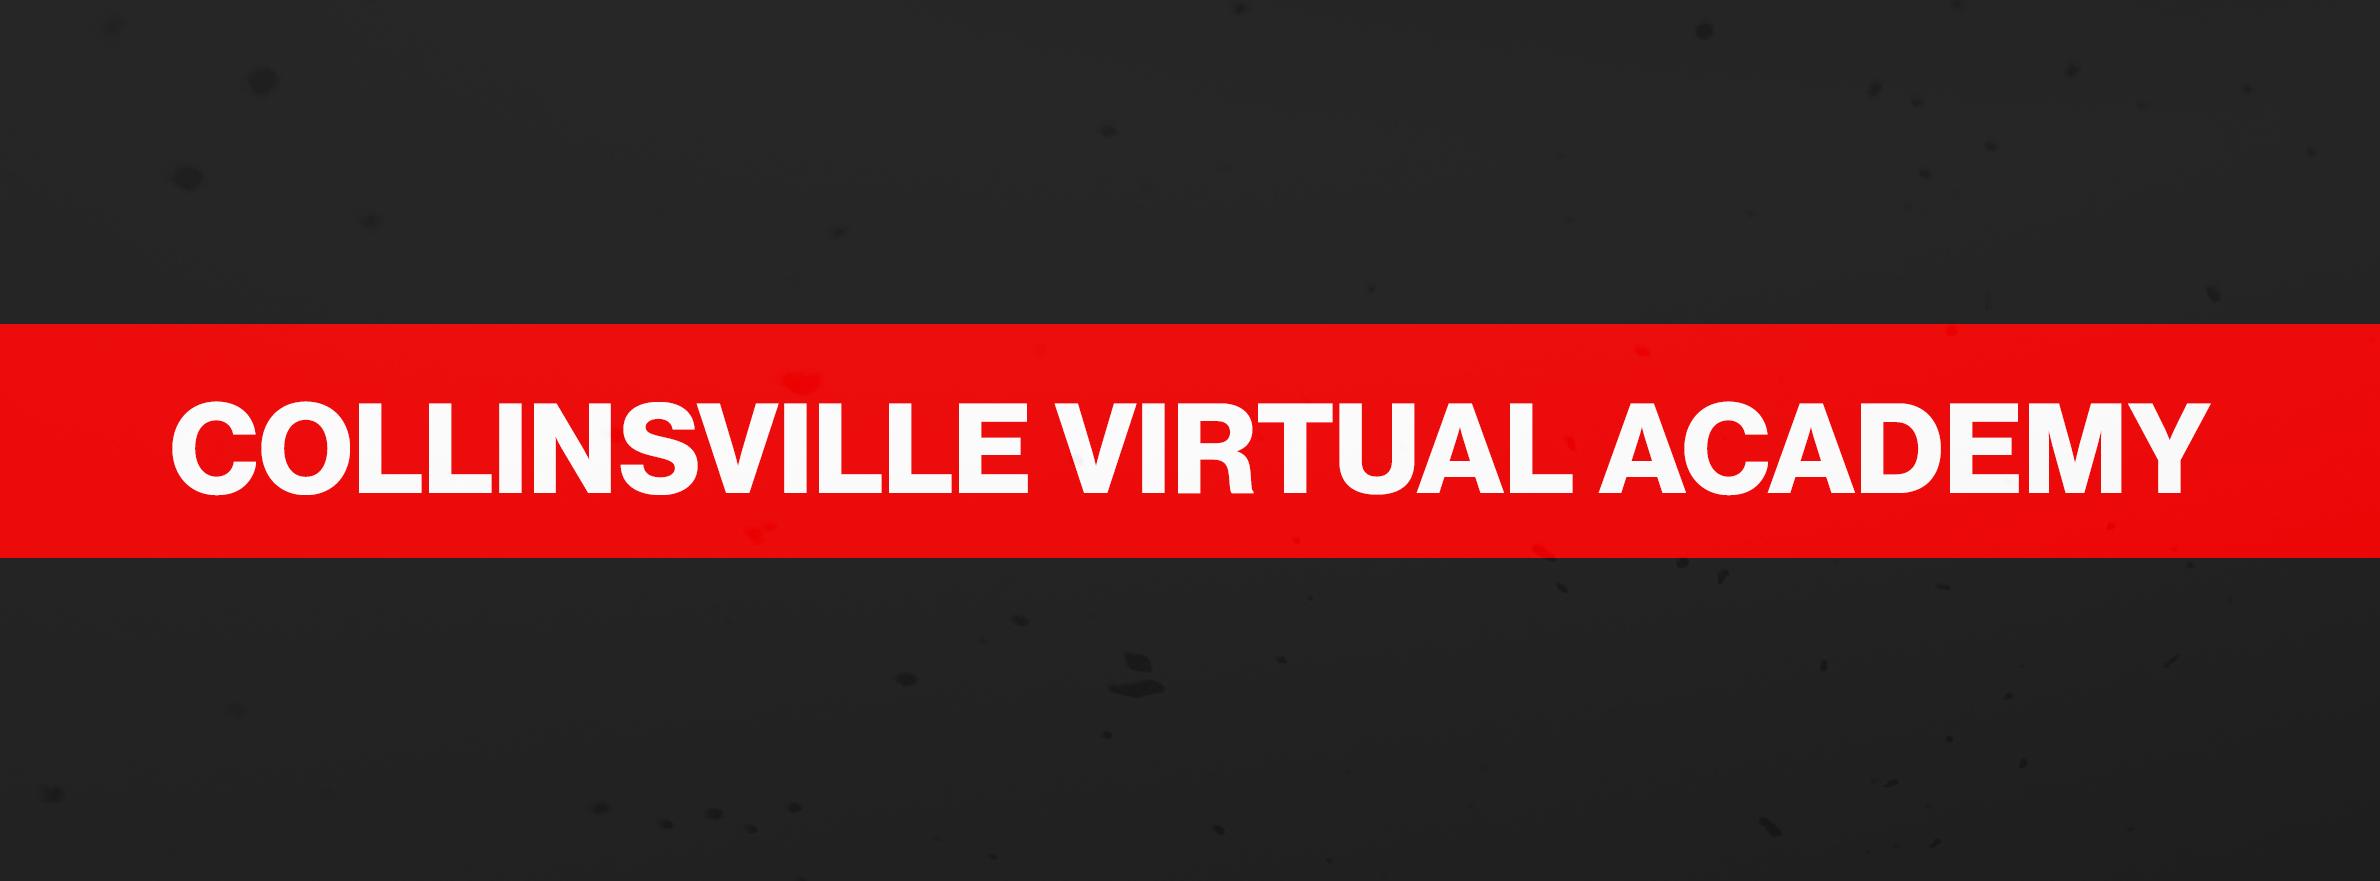 Collinsville Virtual Academy